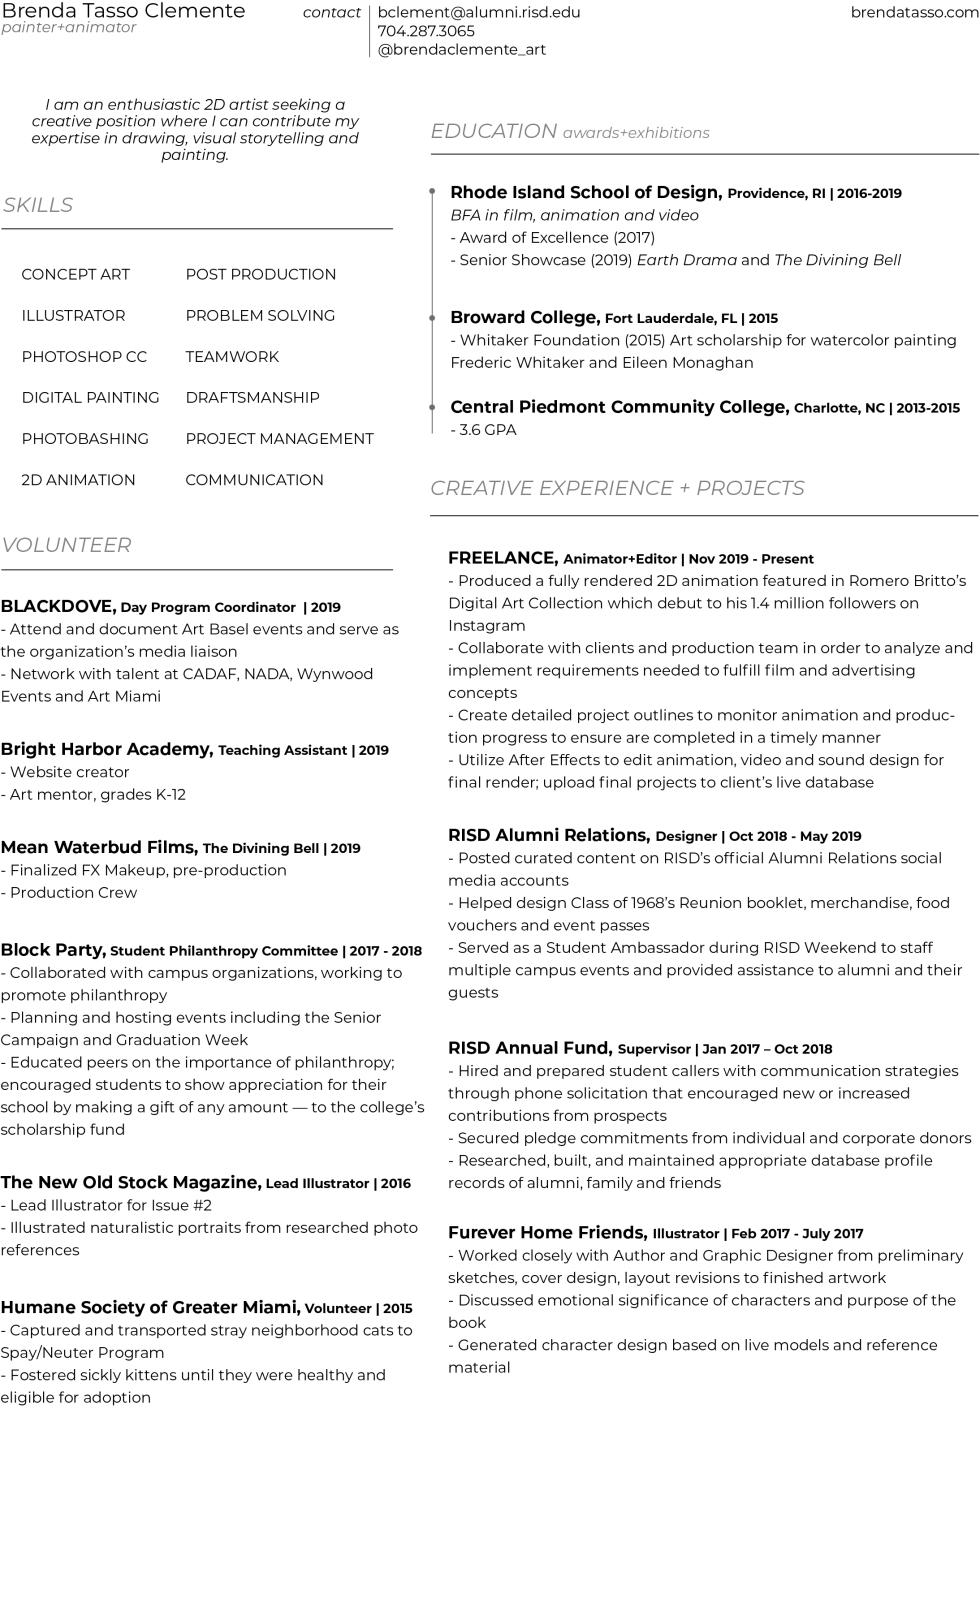 Resume_2020_June